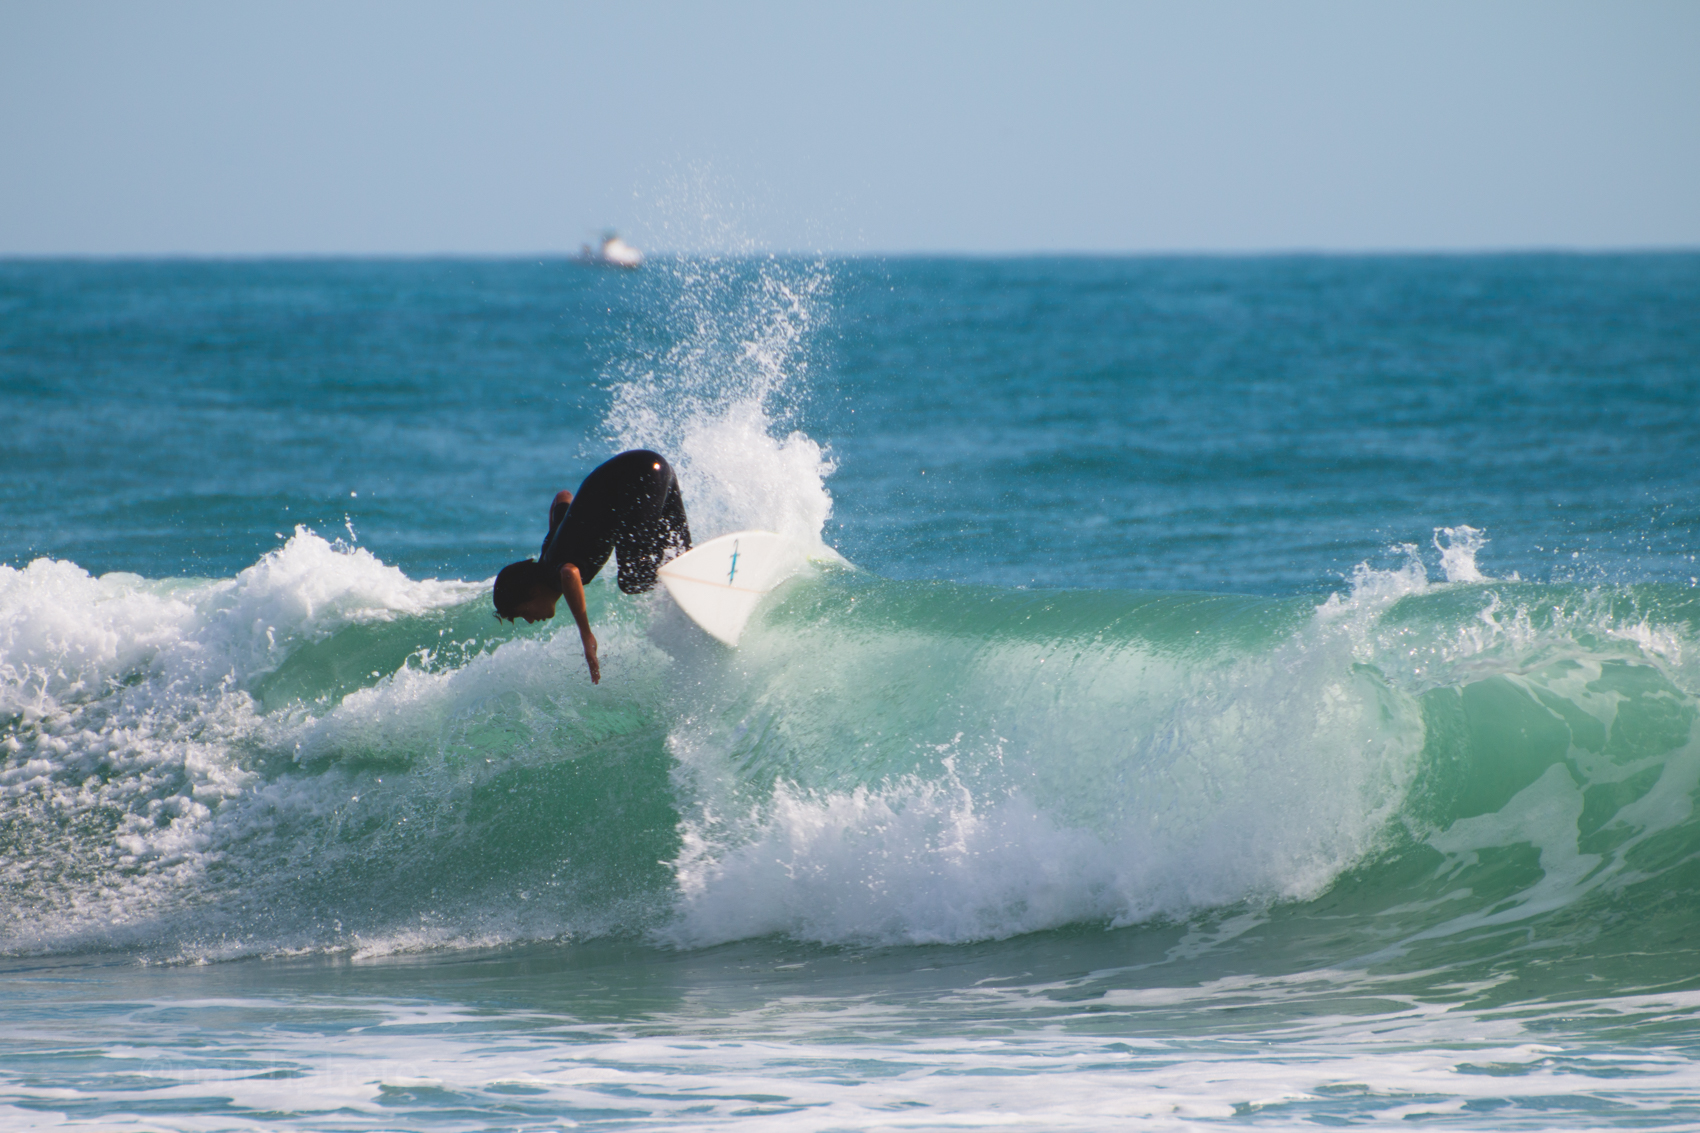 Chase Modelski surfing at Sebastian Inlet, Florida. Photos by Nathaniel Harrington (natehphoto)